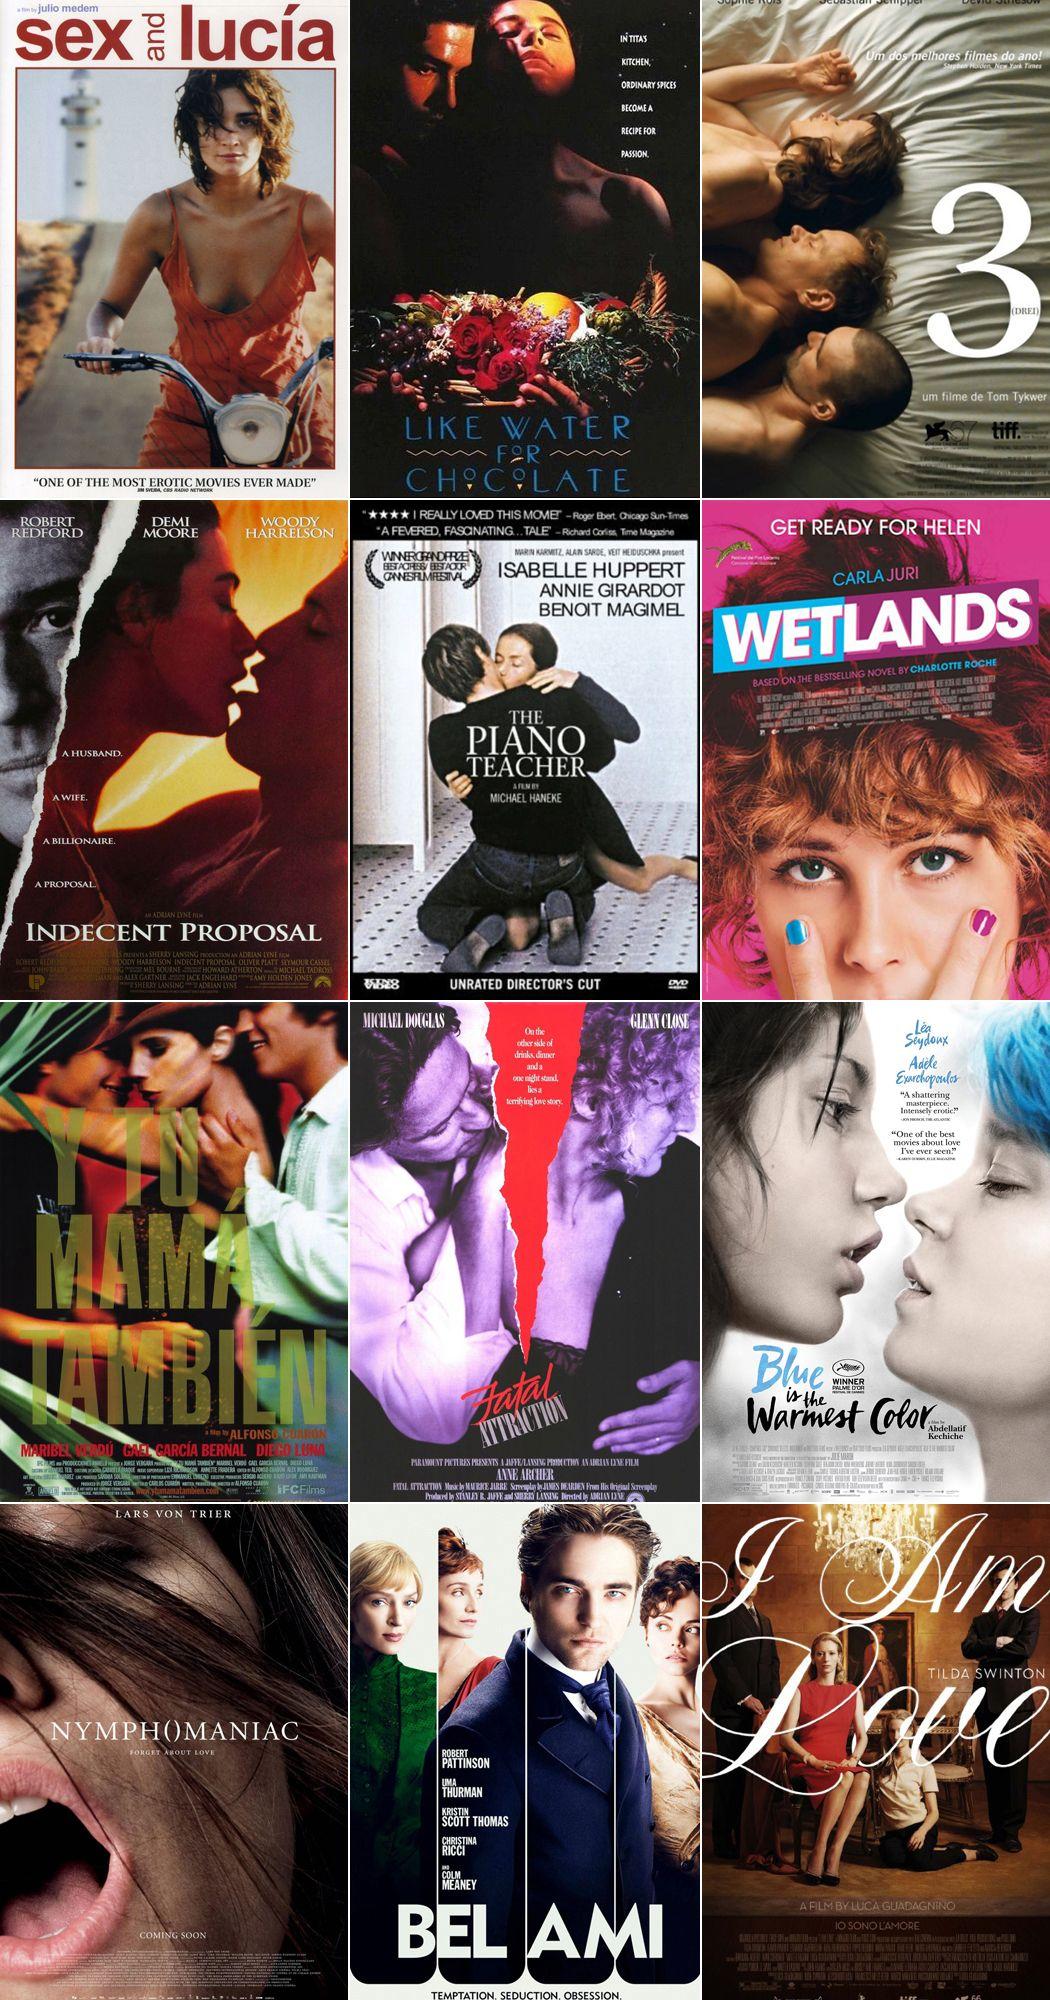 porn movies on netflix Sex-Filled Films to Stream on Netflix   Netflix - Pinterest.